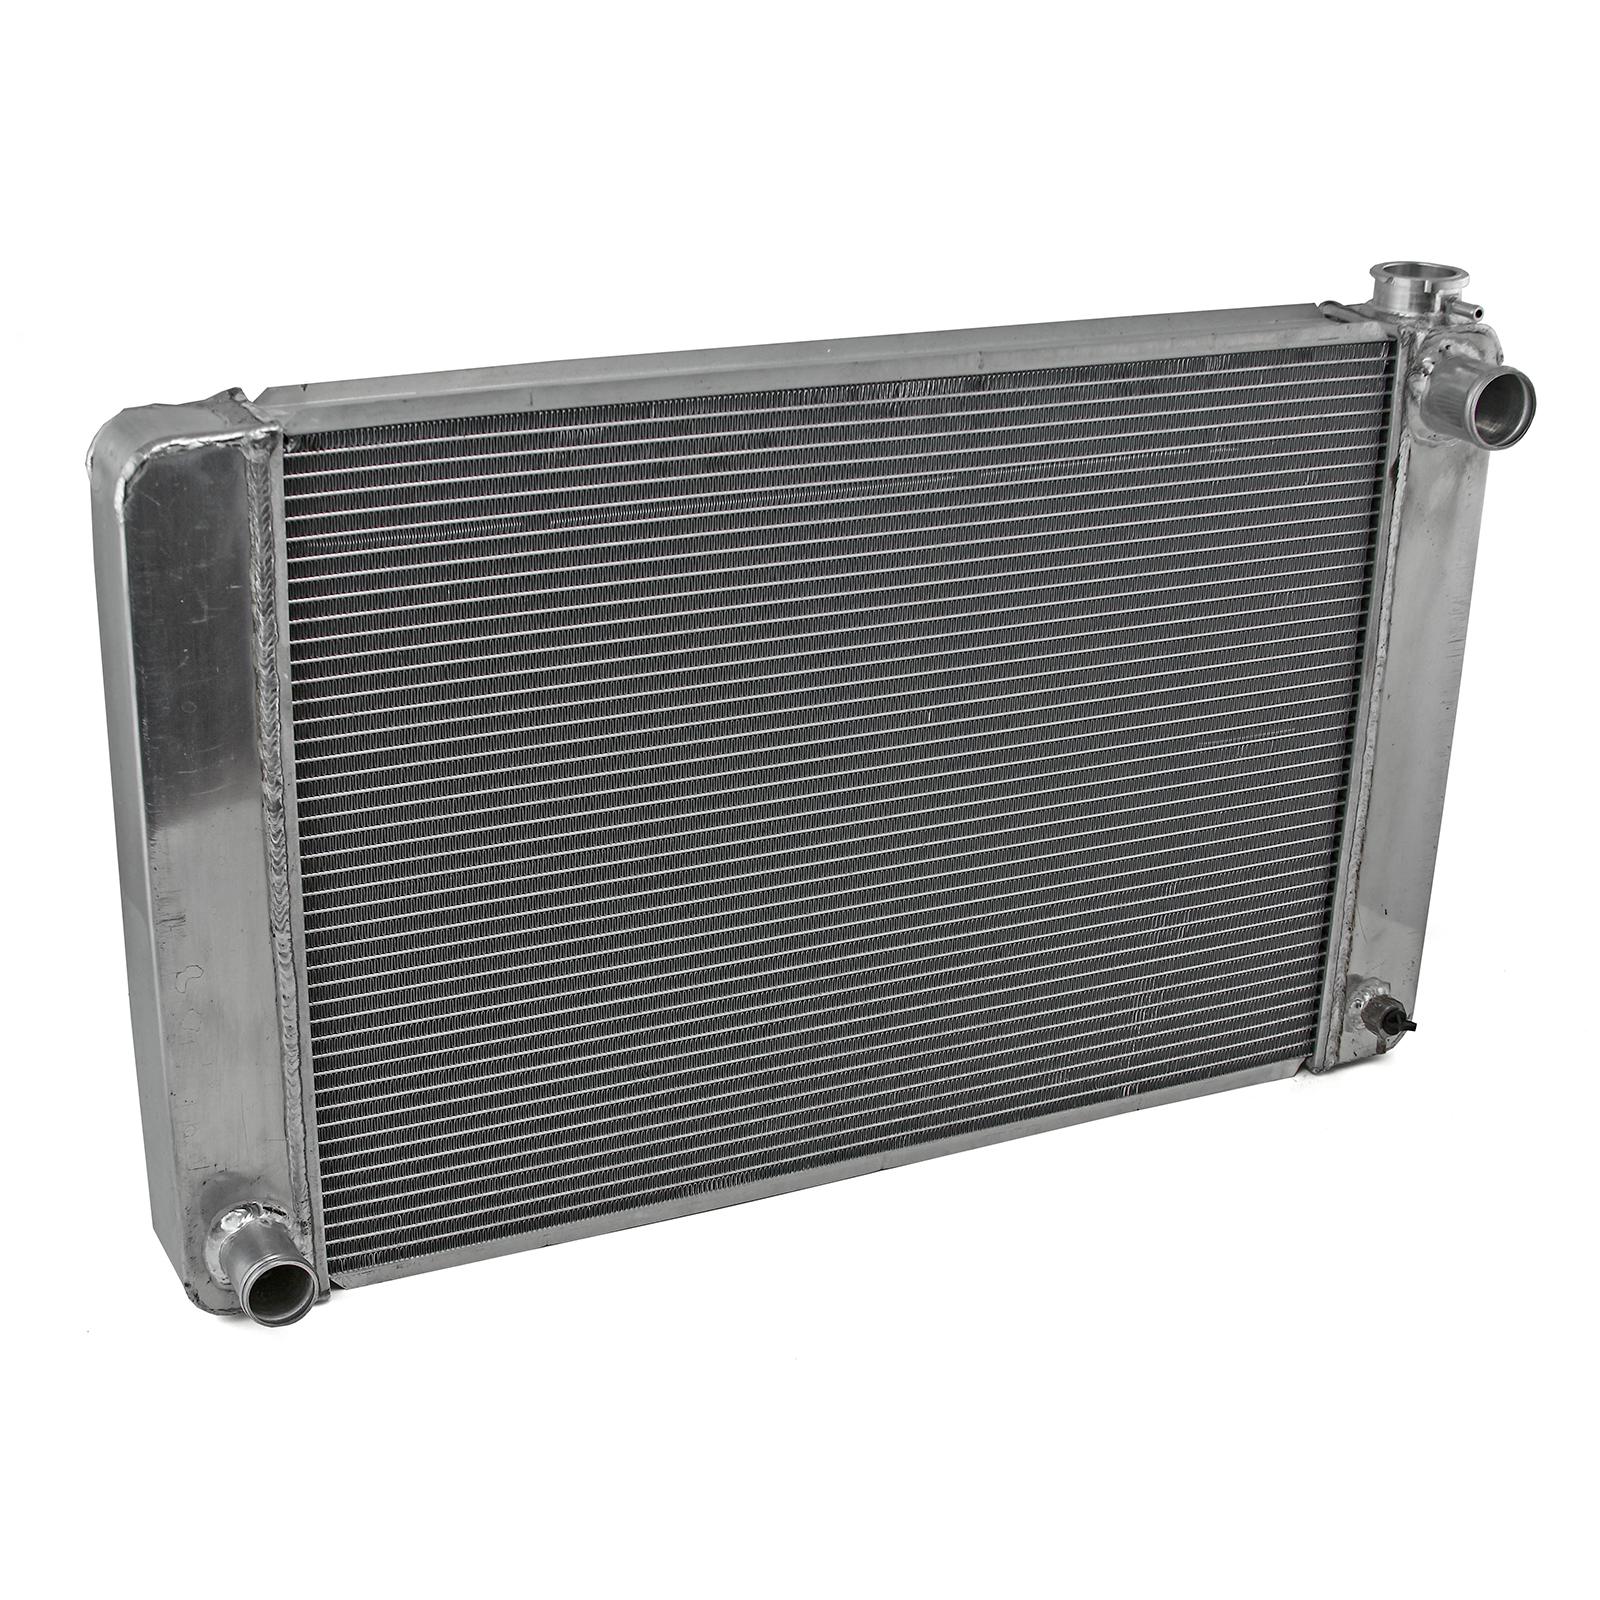 Ford Mopar 29x19x2.2 Aluminum Radiator (TR-BL O/L) Satin